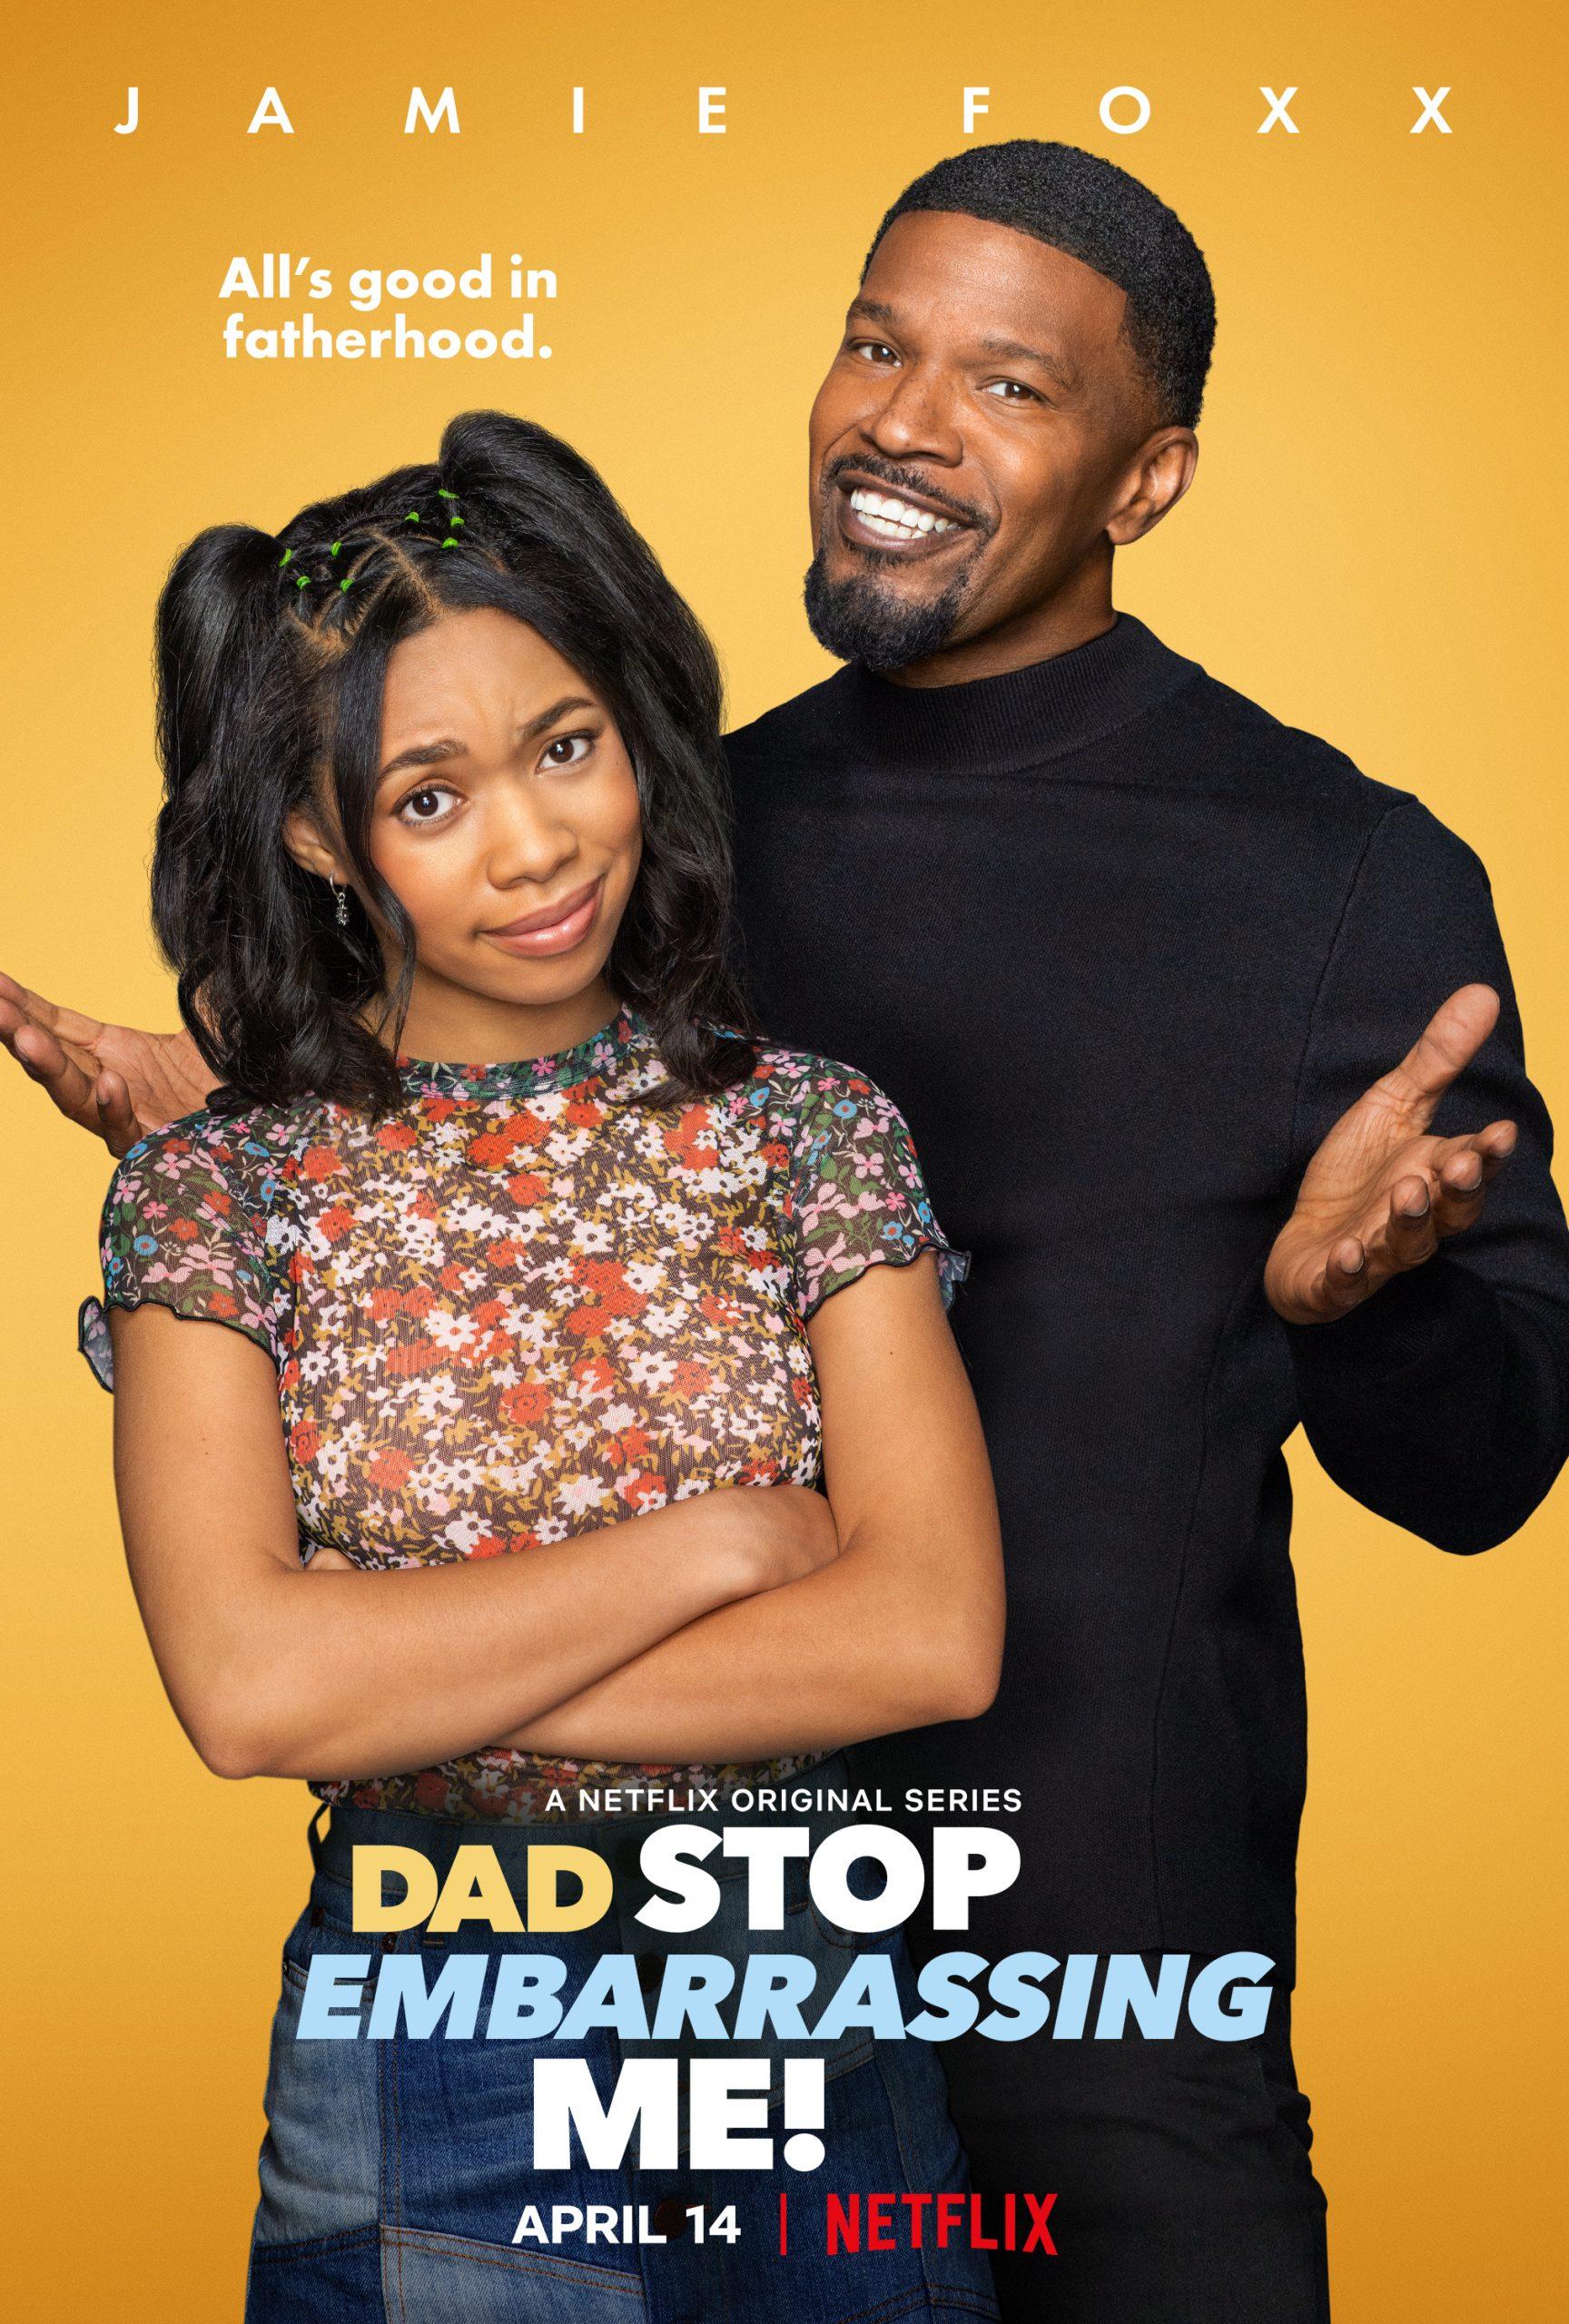 Dad Stop Embarrassing Me (TV series) Fzmovies Download Mp4